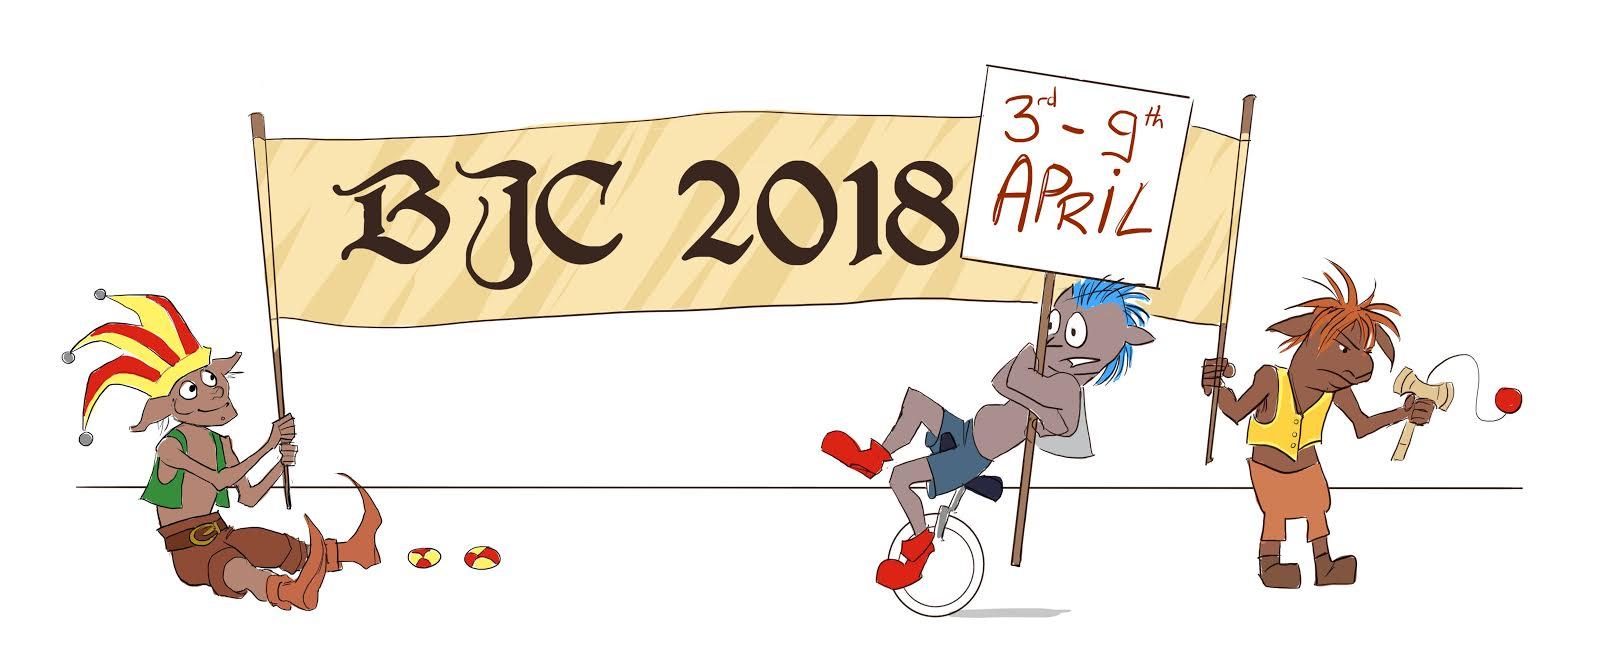 BJC 2018 Canterbury